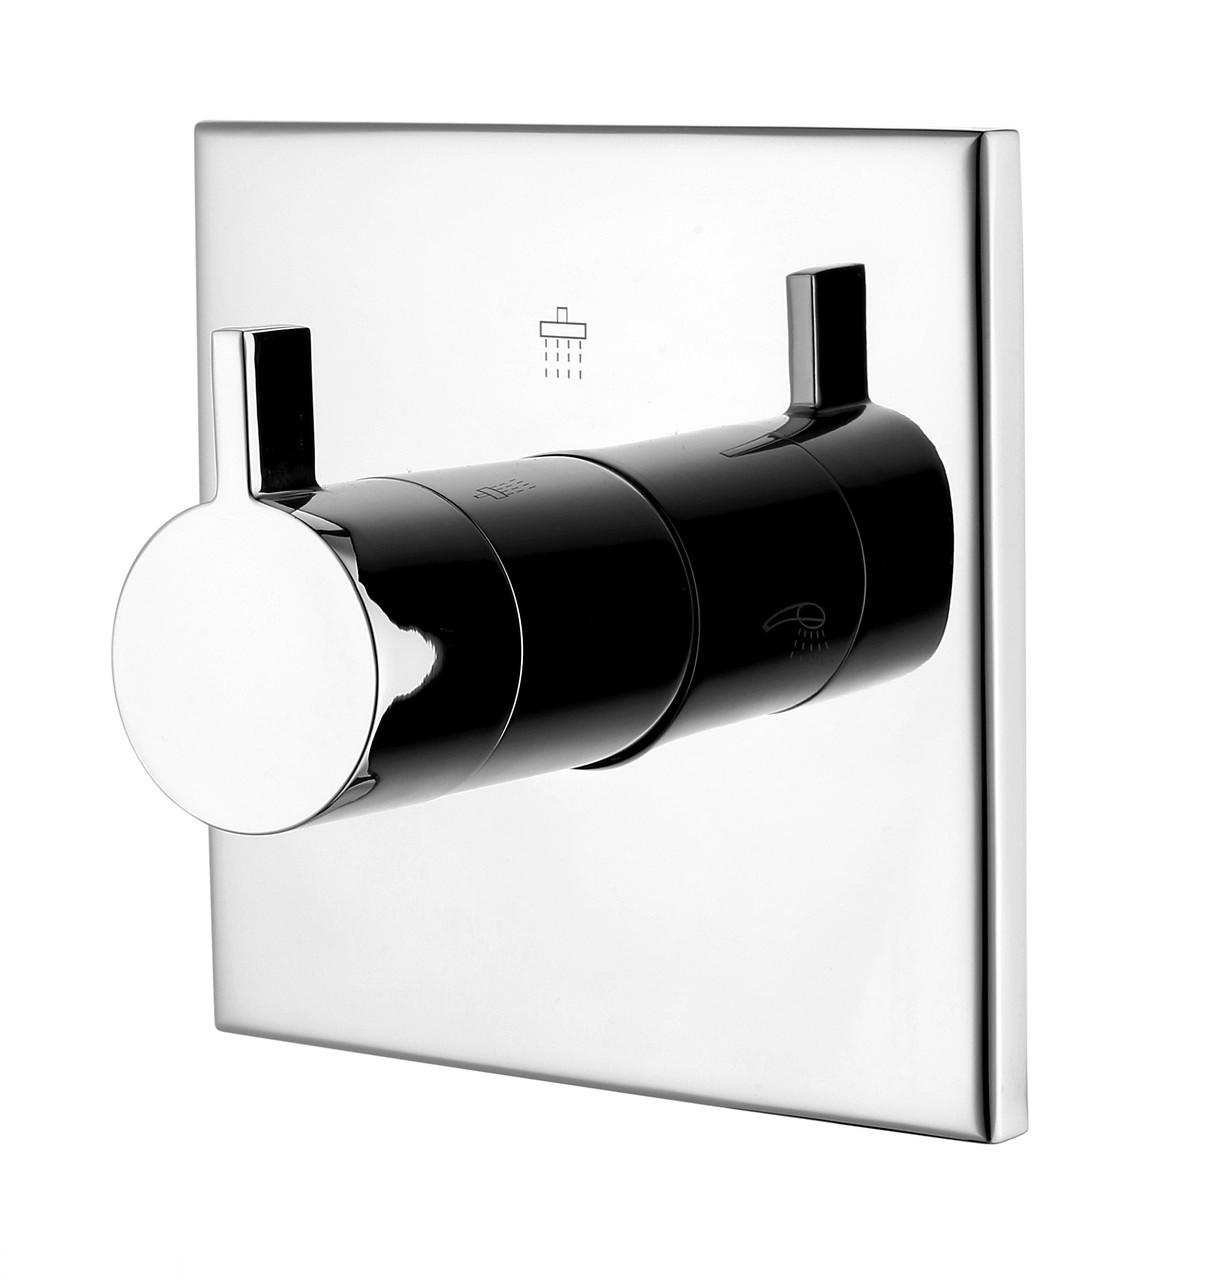 ZAMEK запорный/переключающий вентиль (3 потребителя), форма S